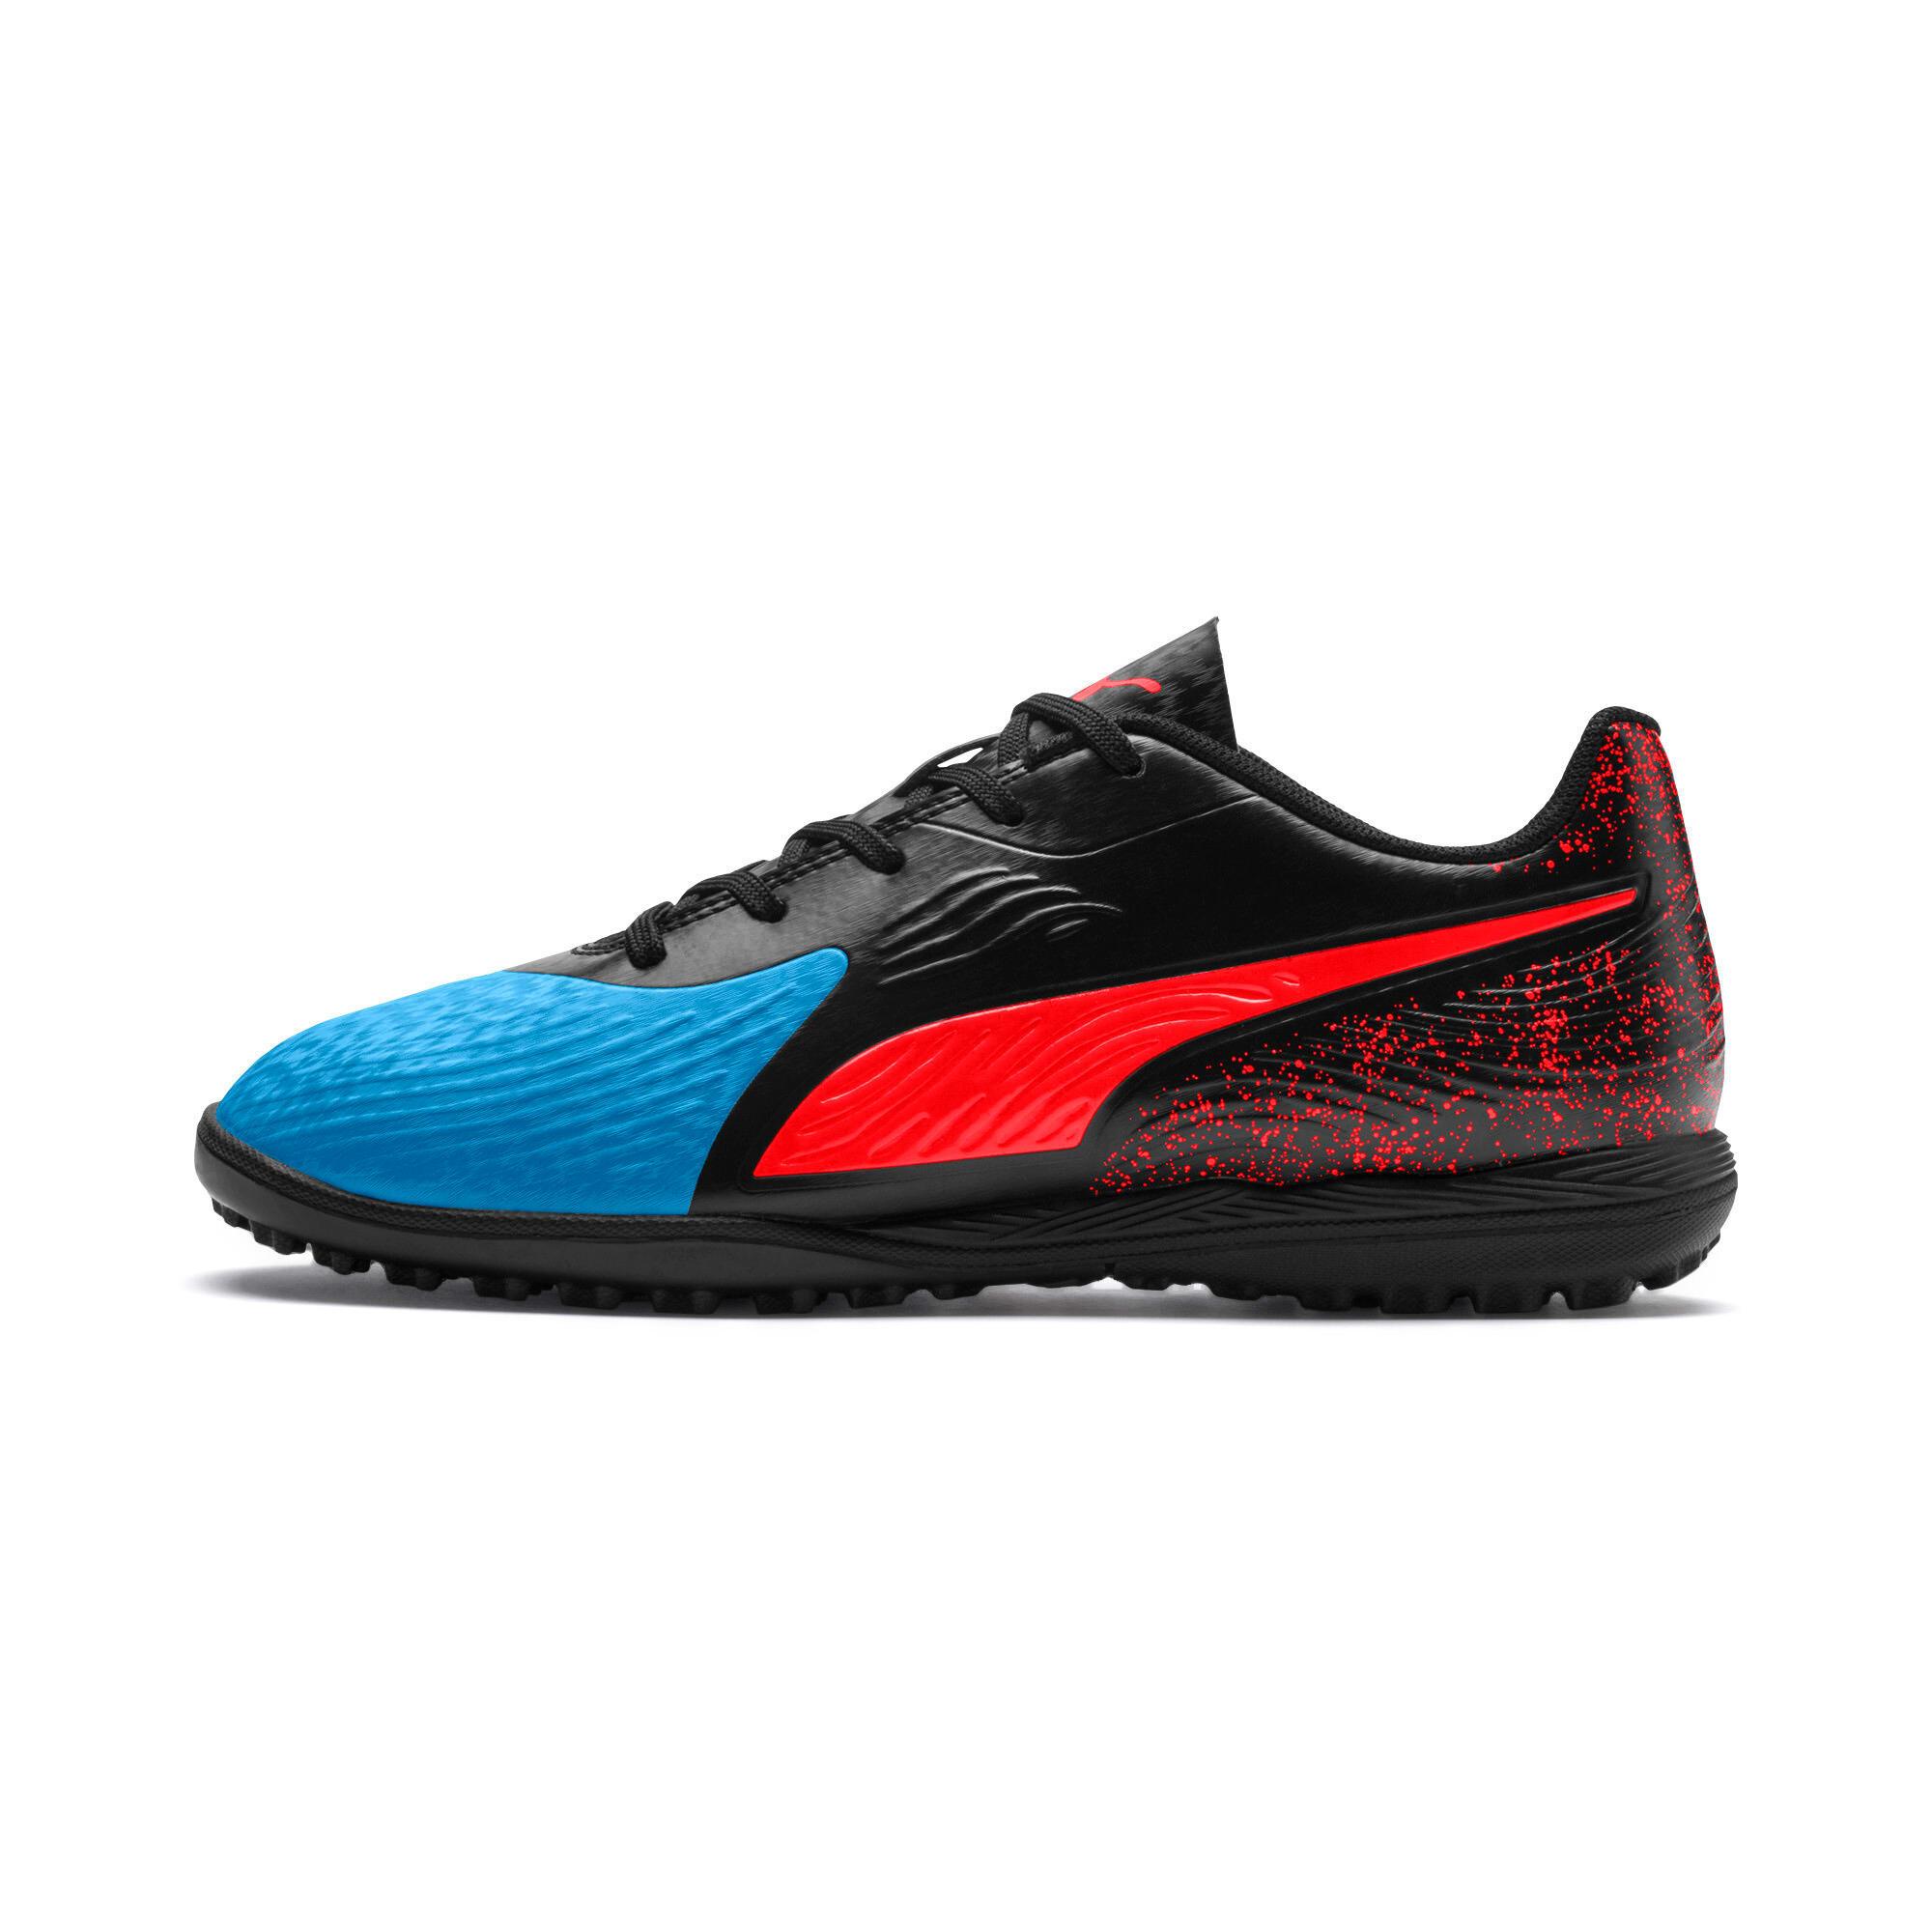 Thumbnail 1 of PUMA ONE 19.4 TT Soccer Shoes JR, Bleu Azur-Red Blast-Black, medium